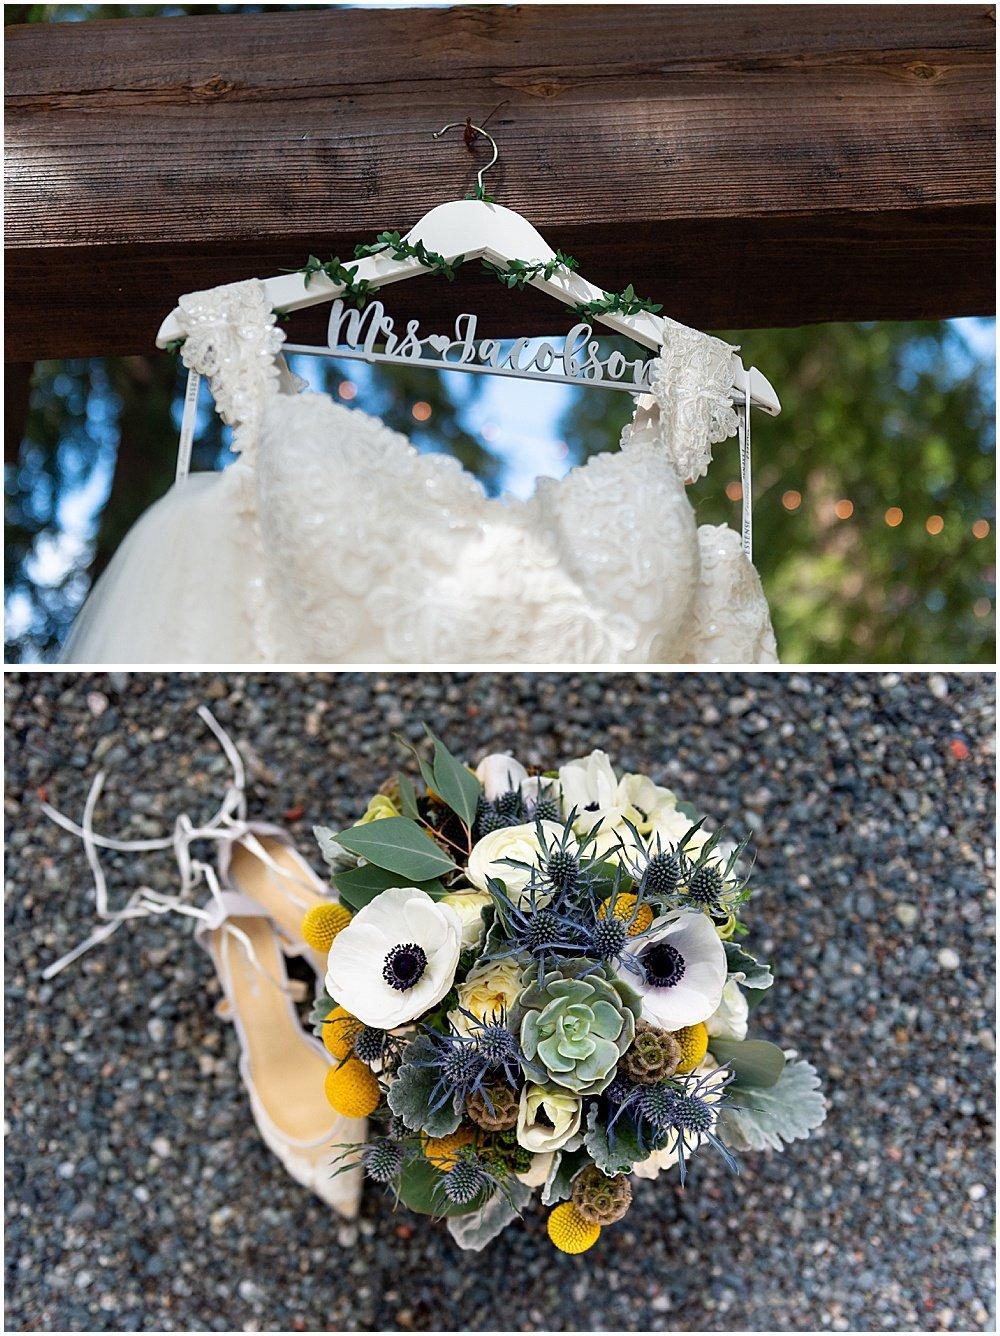 brides dress and flowers Deer Park Villa Wedding Fairfax